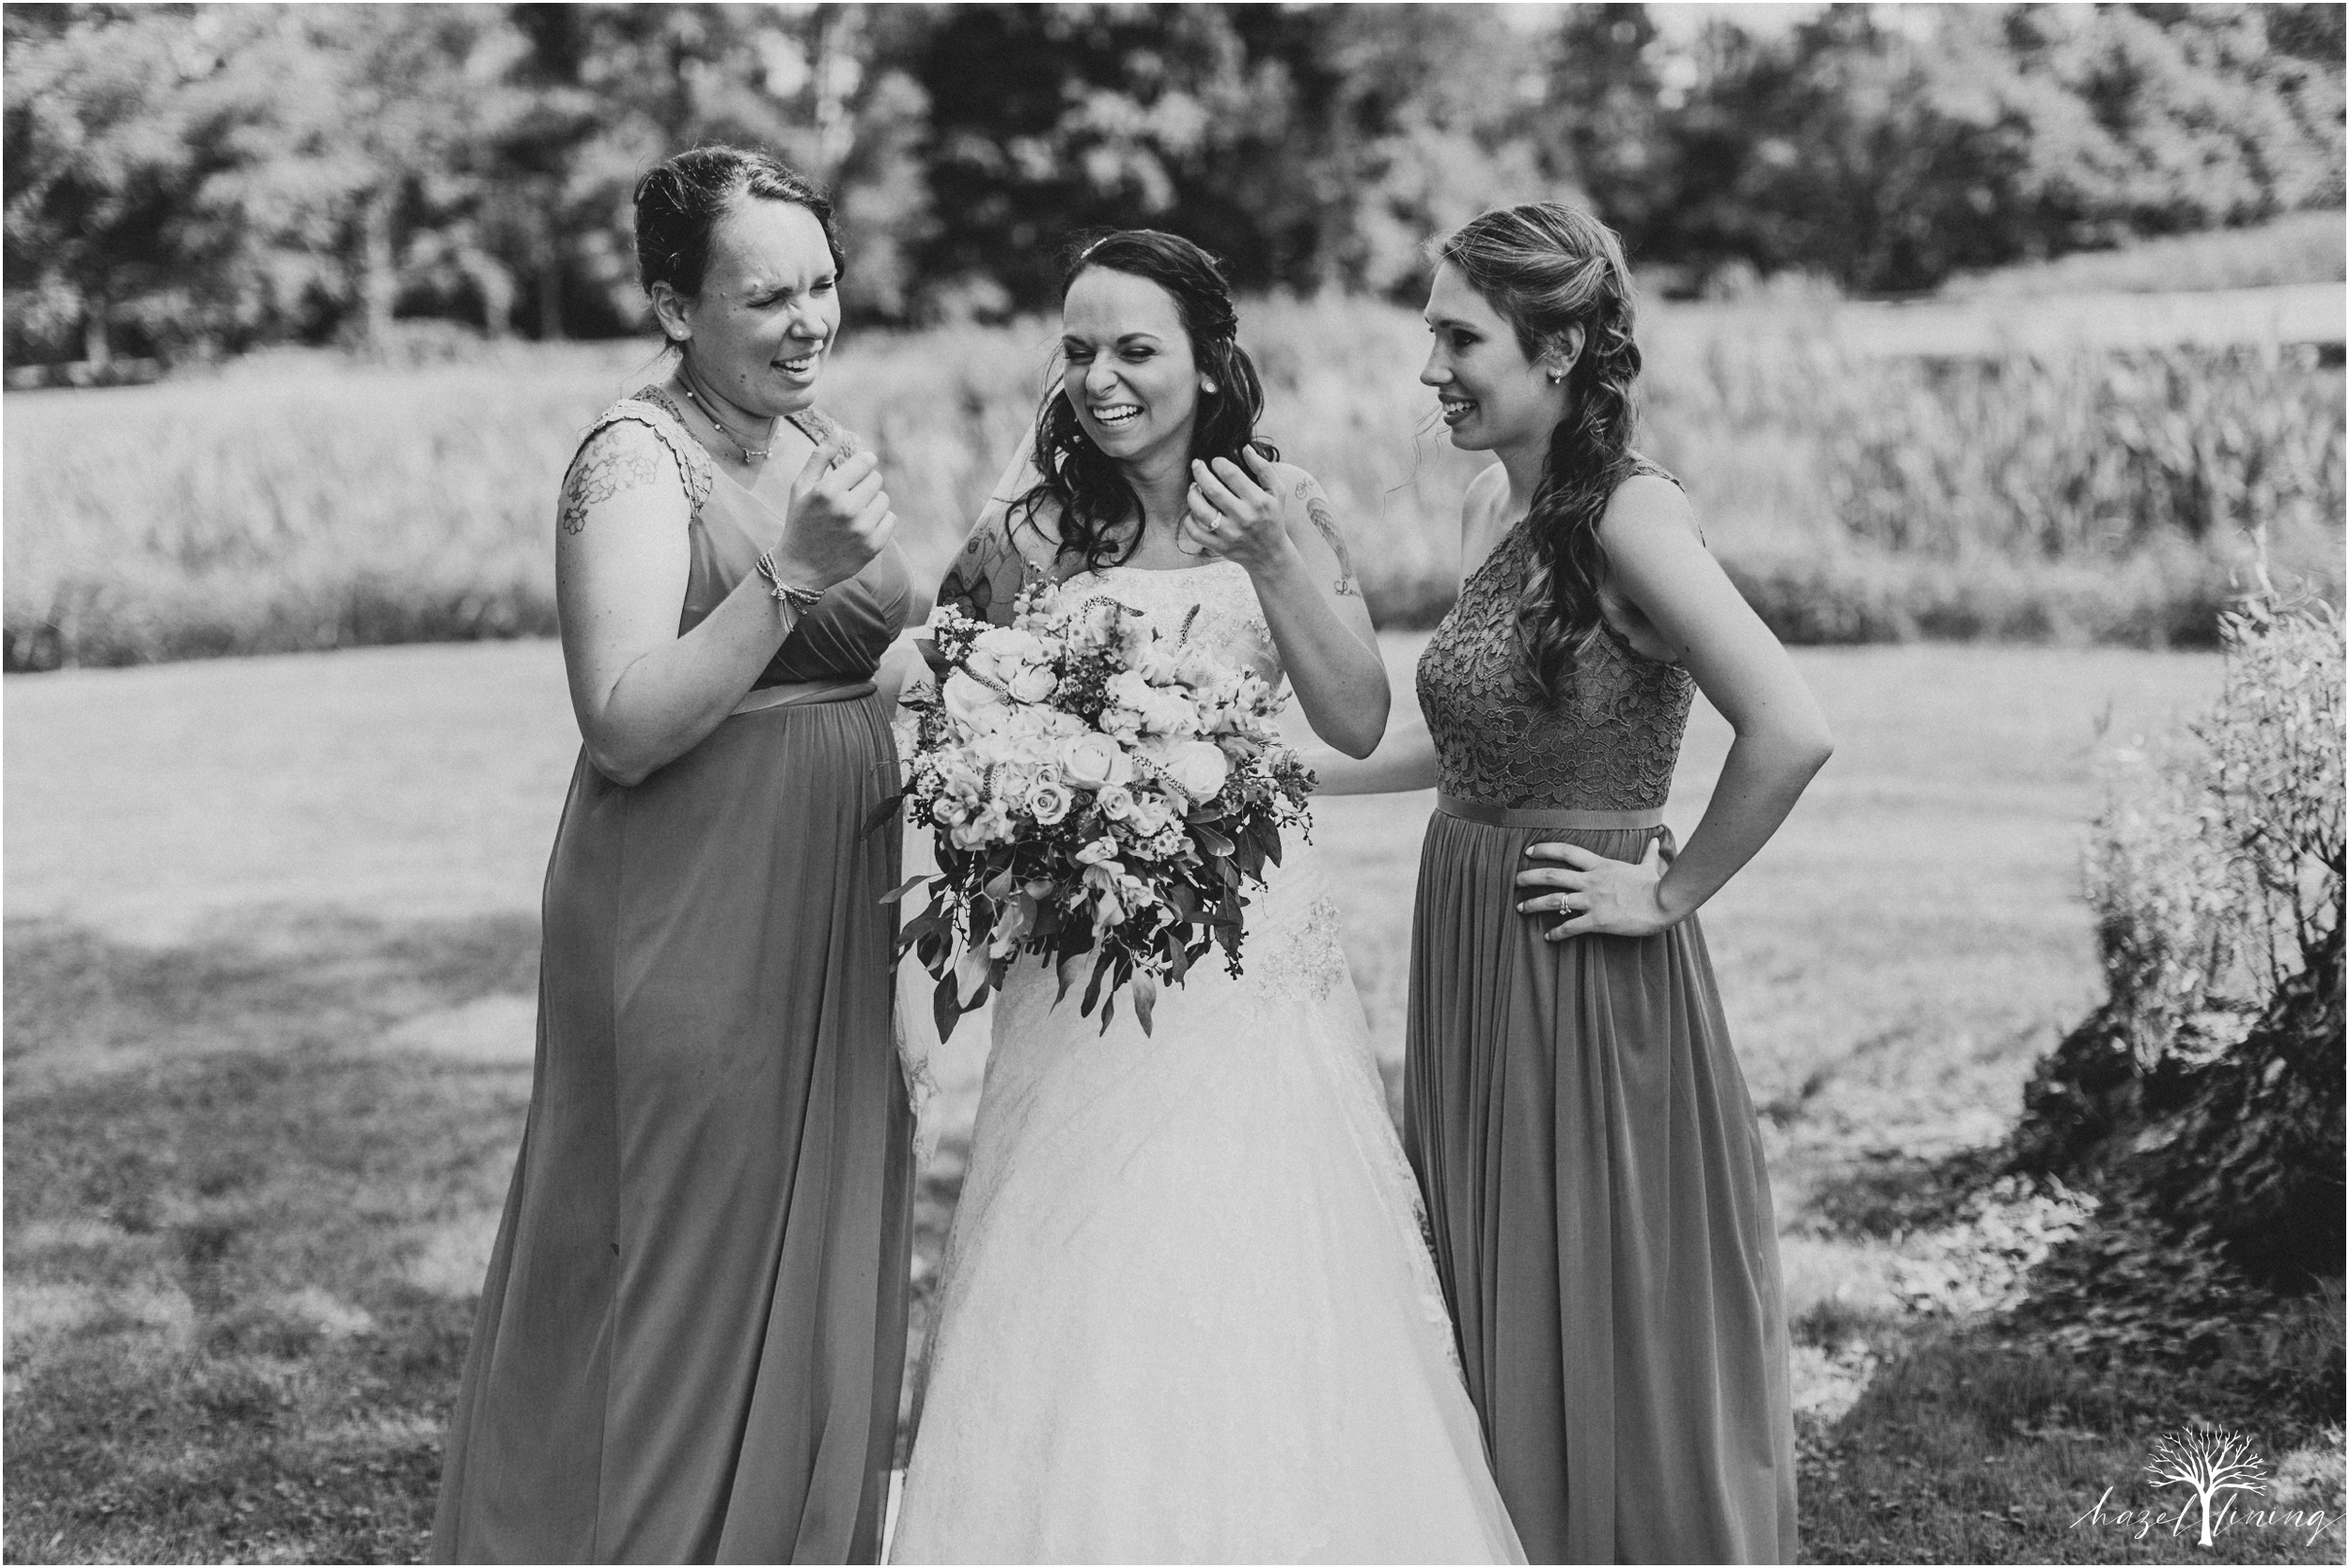 alyssa-james-stiteler-wedding-loft-and-sweet-water-cc-pennsburg-pennsylvania-hazel-lining-travel-wedding-elopement-photography_0068.jpg